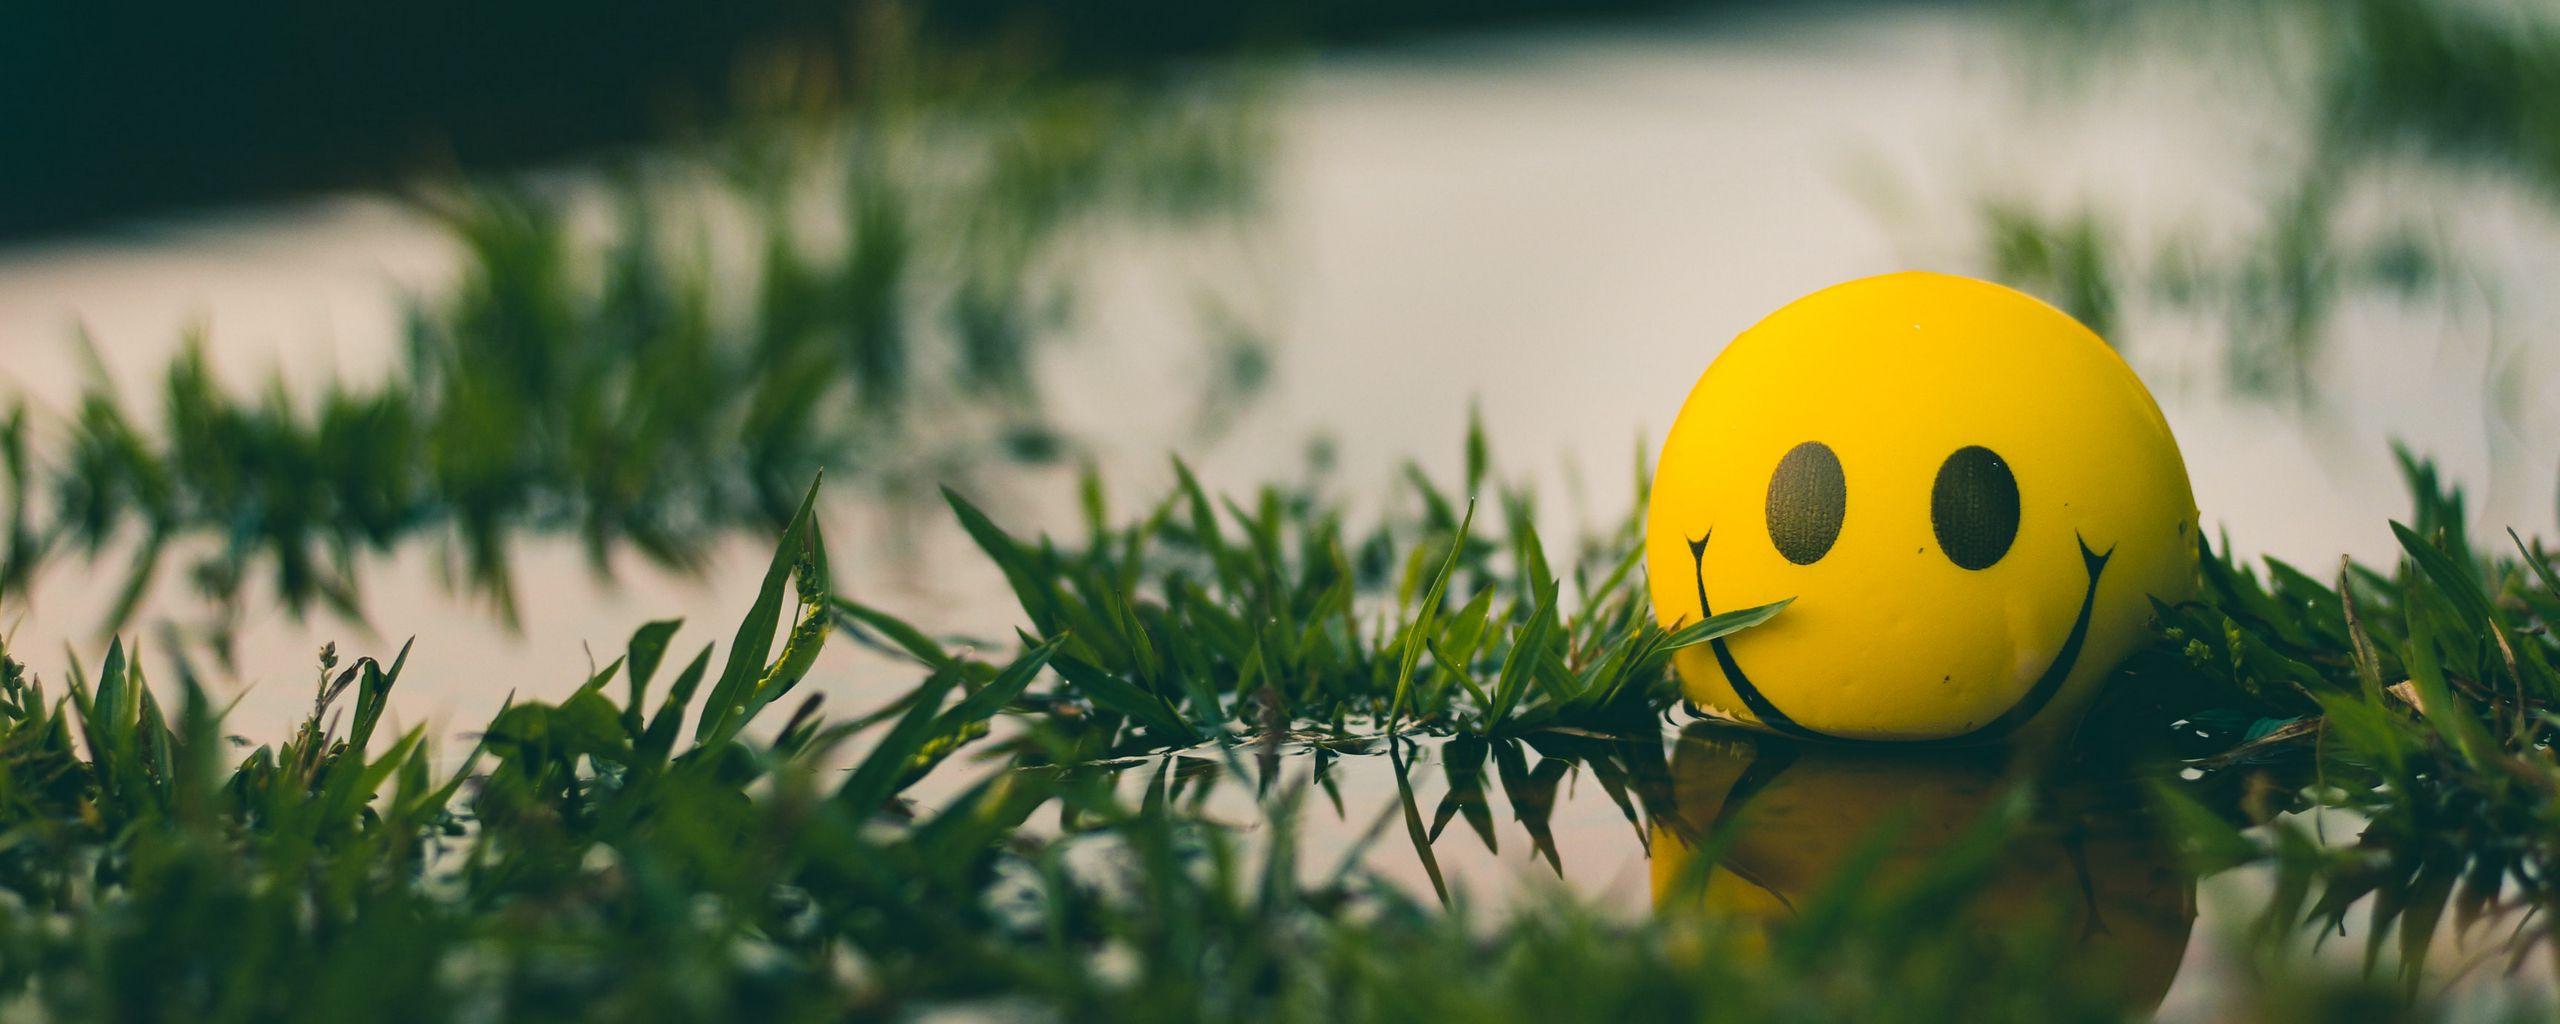 2560x1024 Wallpaper ball, smile, smiley, grass, water